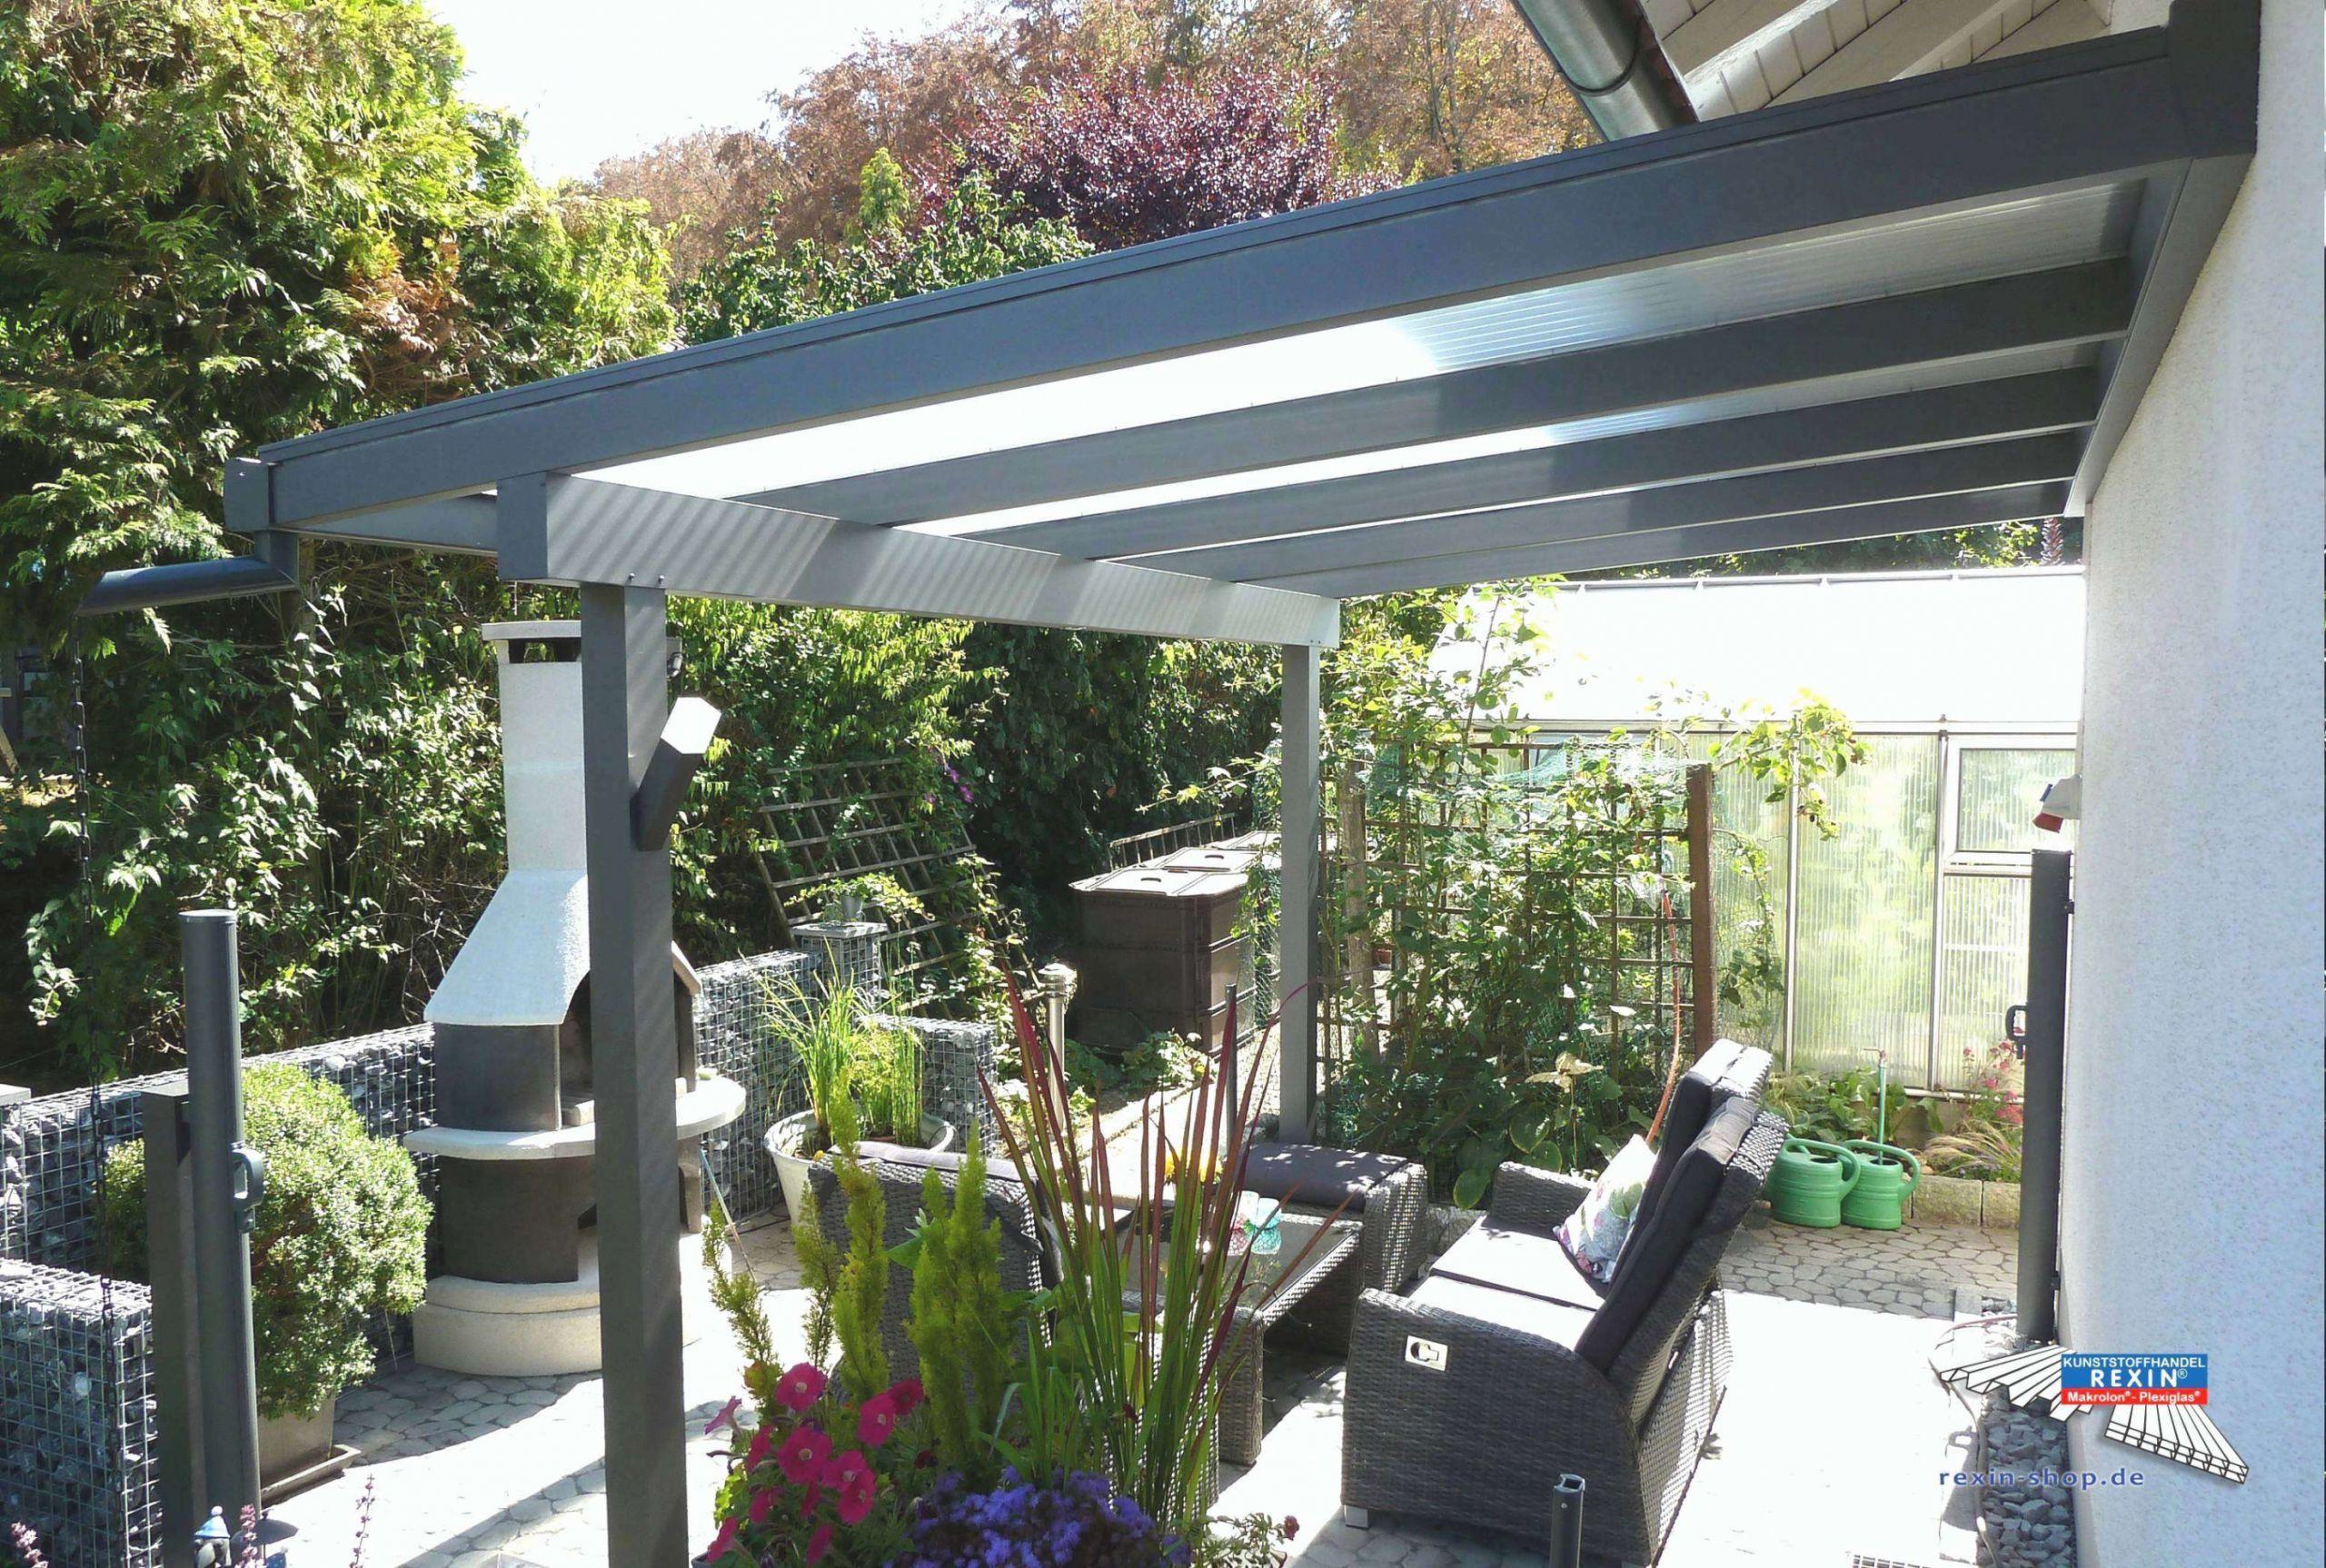 Garten Ideen Deko Elegant Deko Garten Selber Machen — Temobardz Home Blog